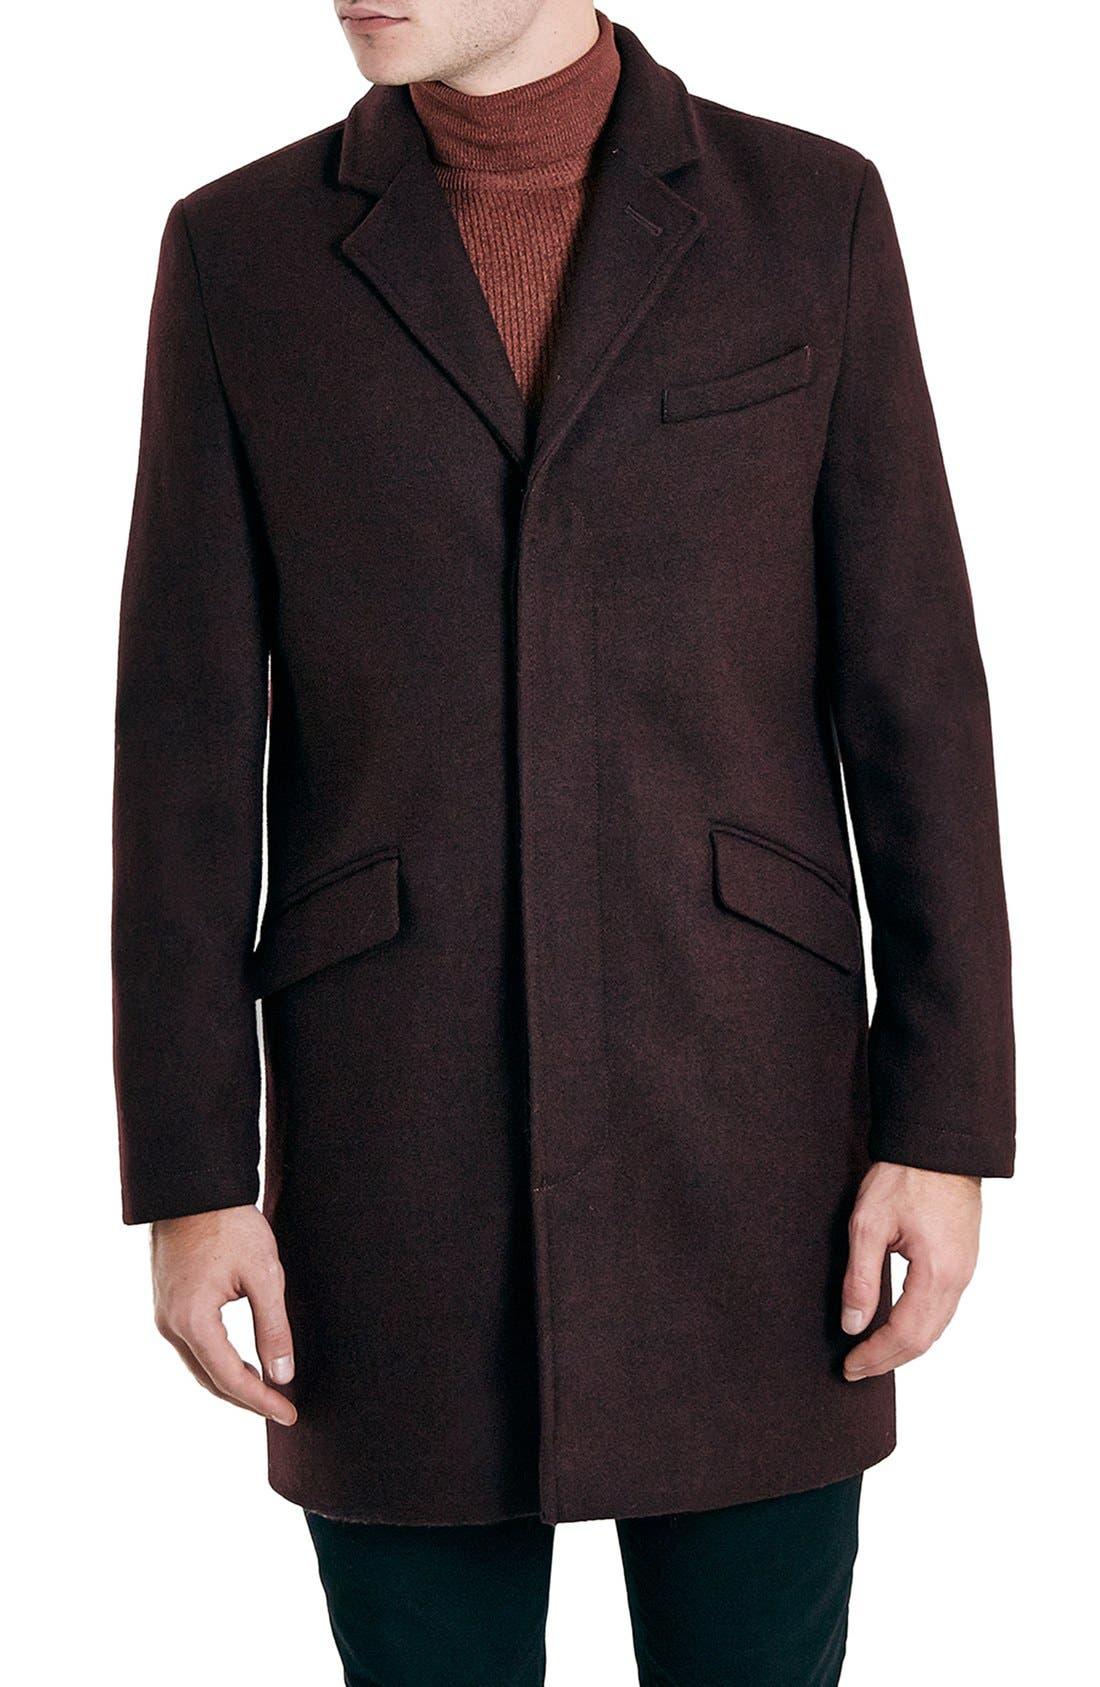 Burgundy Topcoat, Main, color, 930